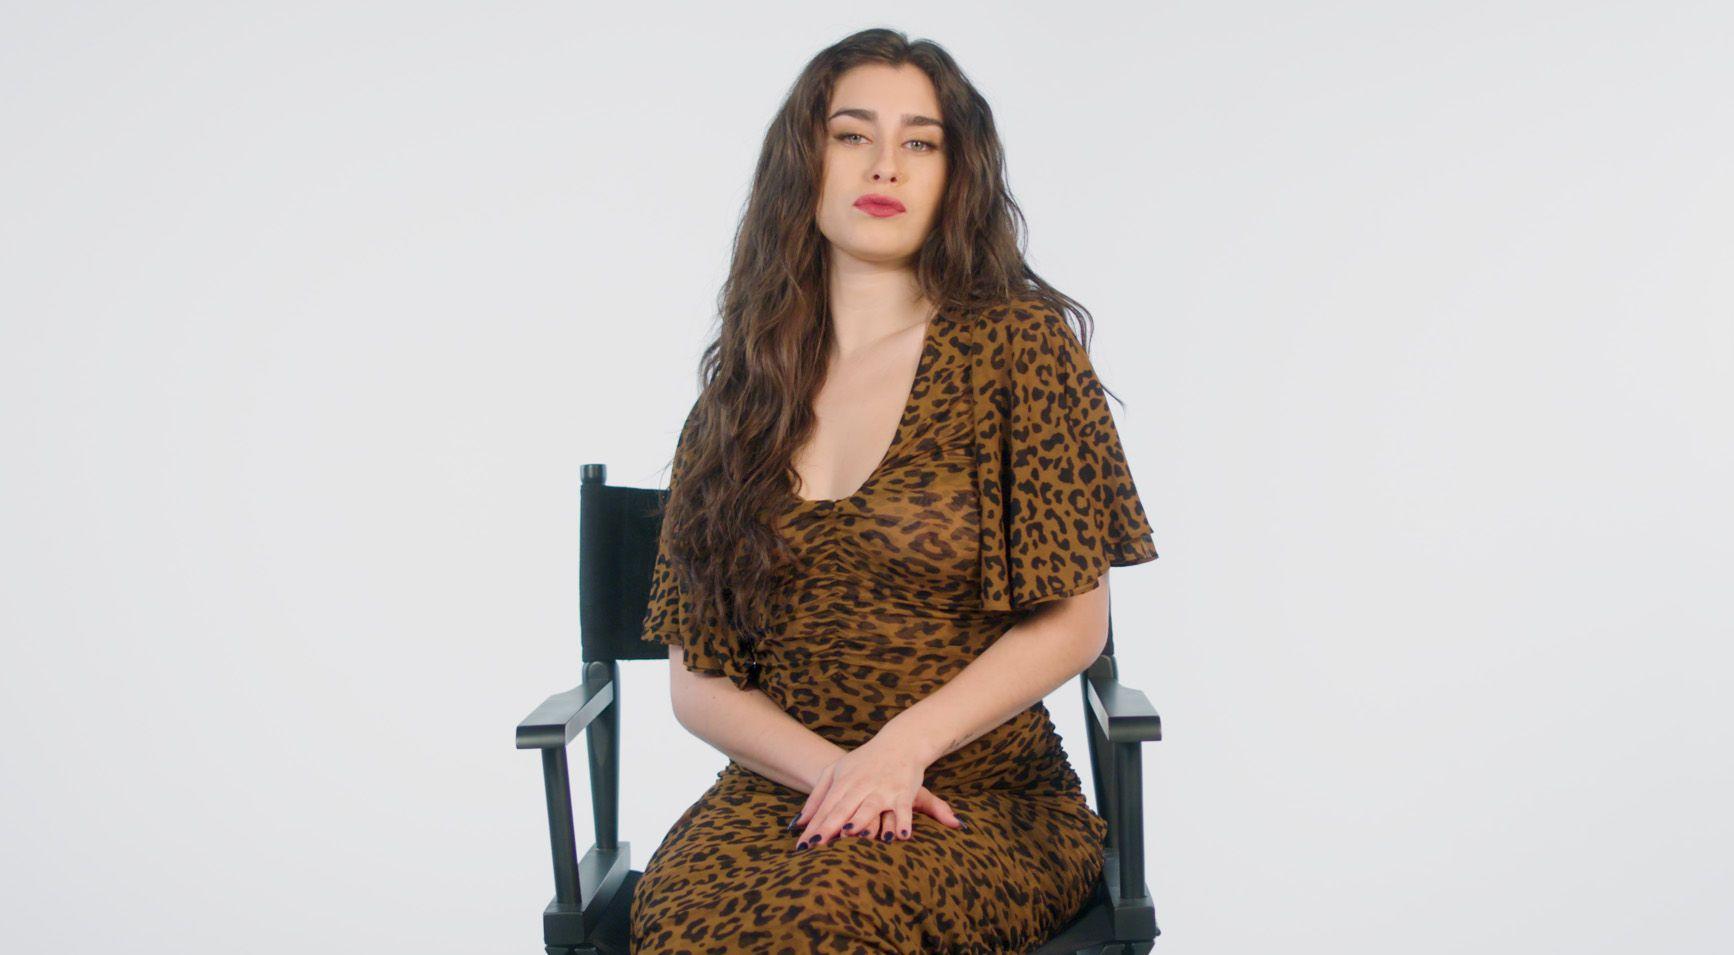 Selfie Natalie Dormer naked (89 photo), Sexy, Cleavage, Boobs, cleavage 2019